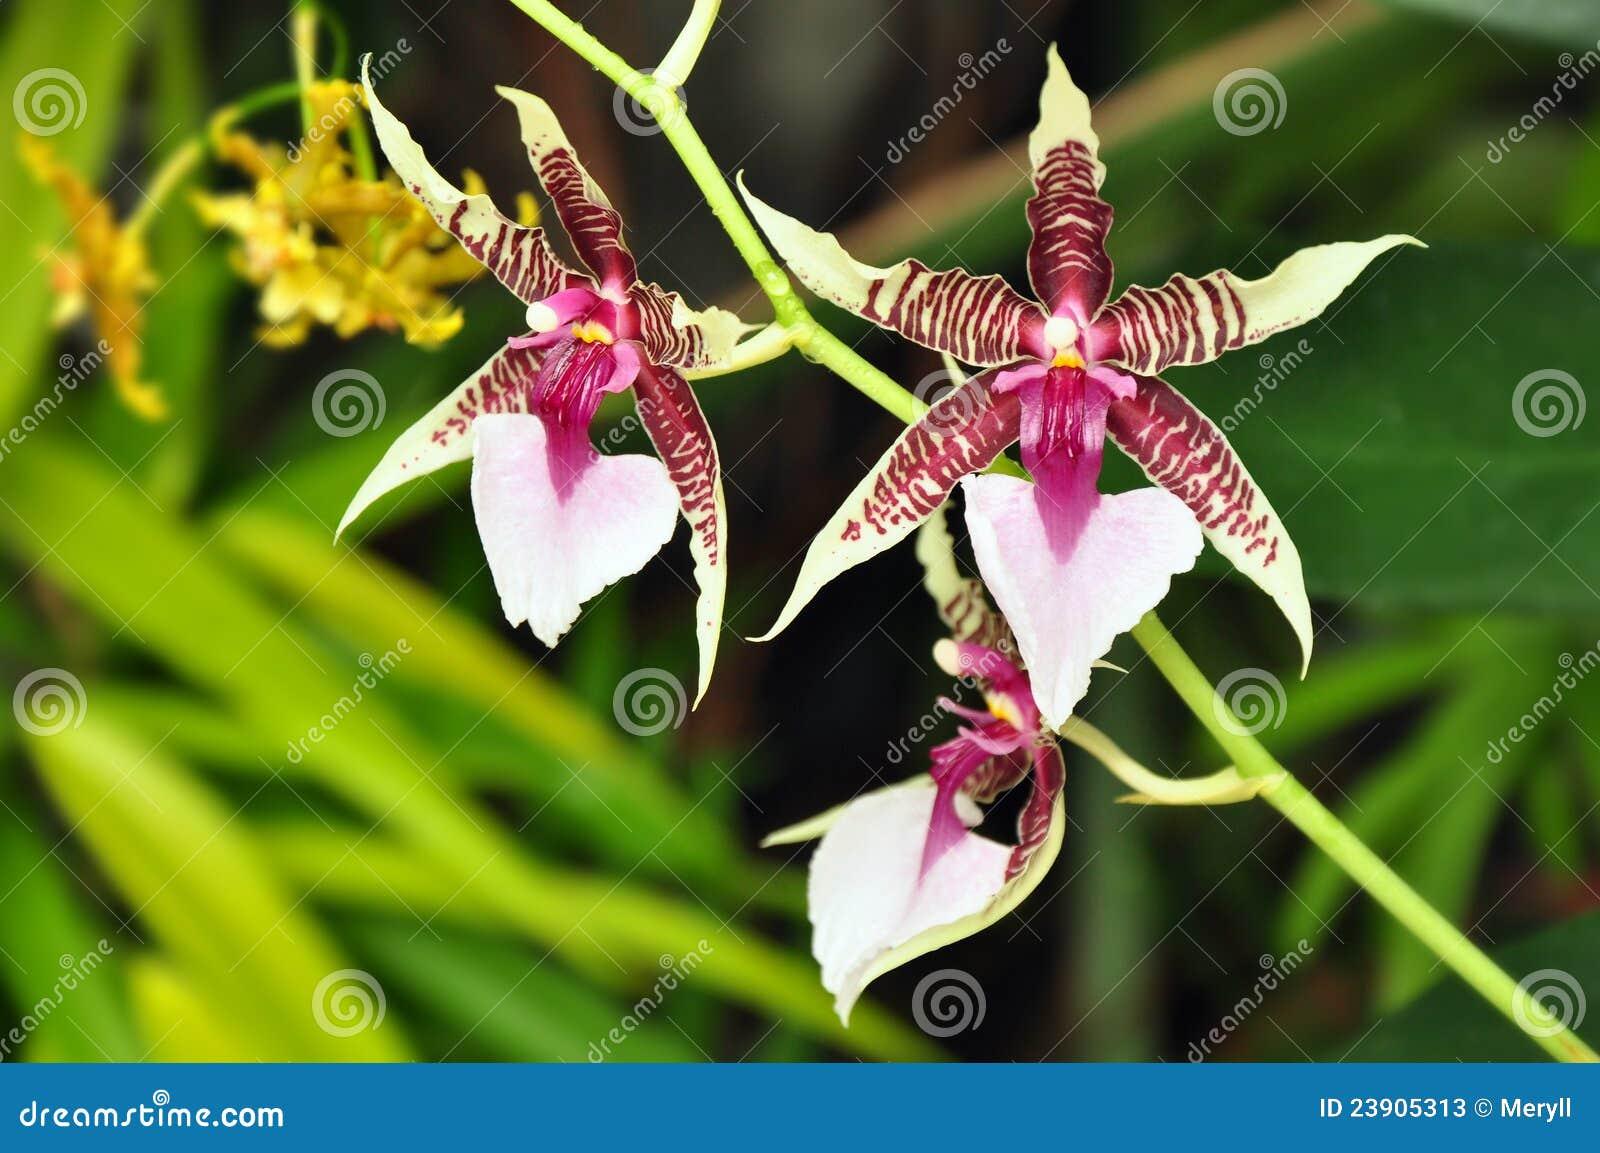 tropical flower exotic stock photos image 23905313. Black Bedroom Furniture Sets. Home Design Ideas